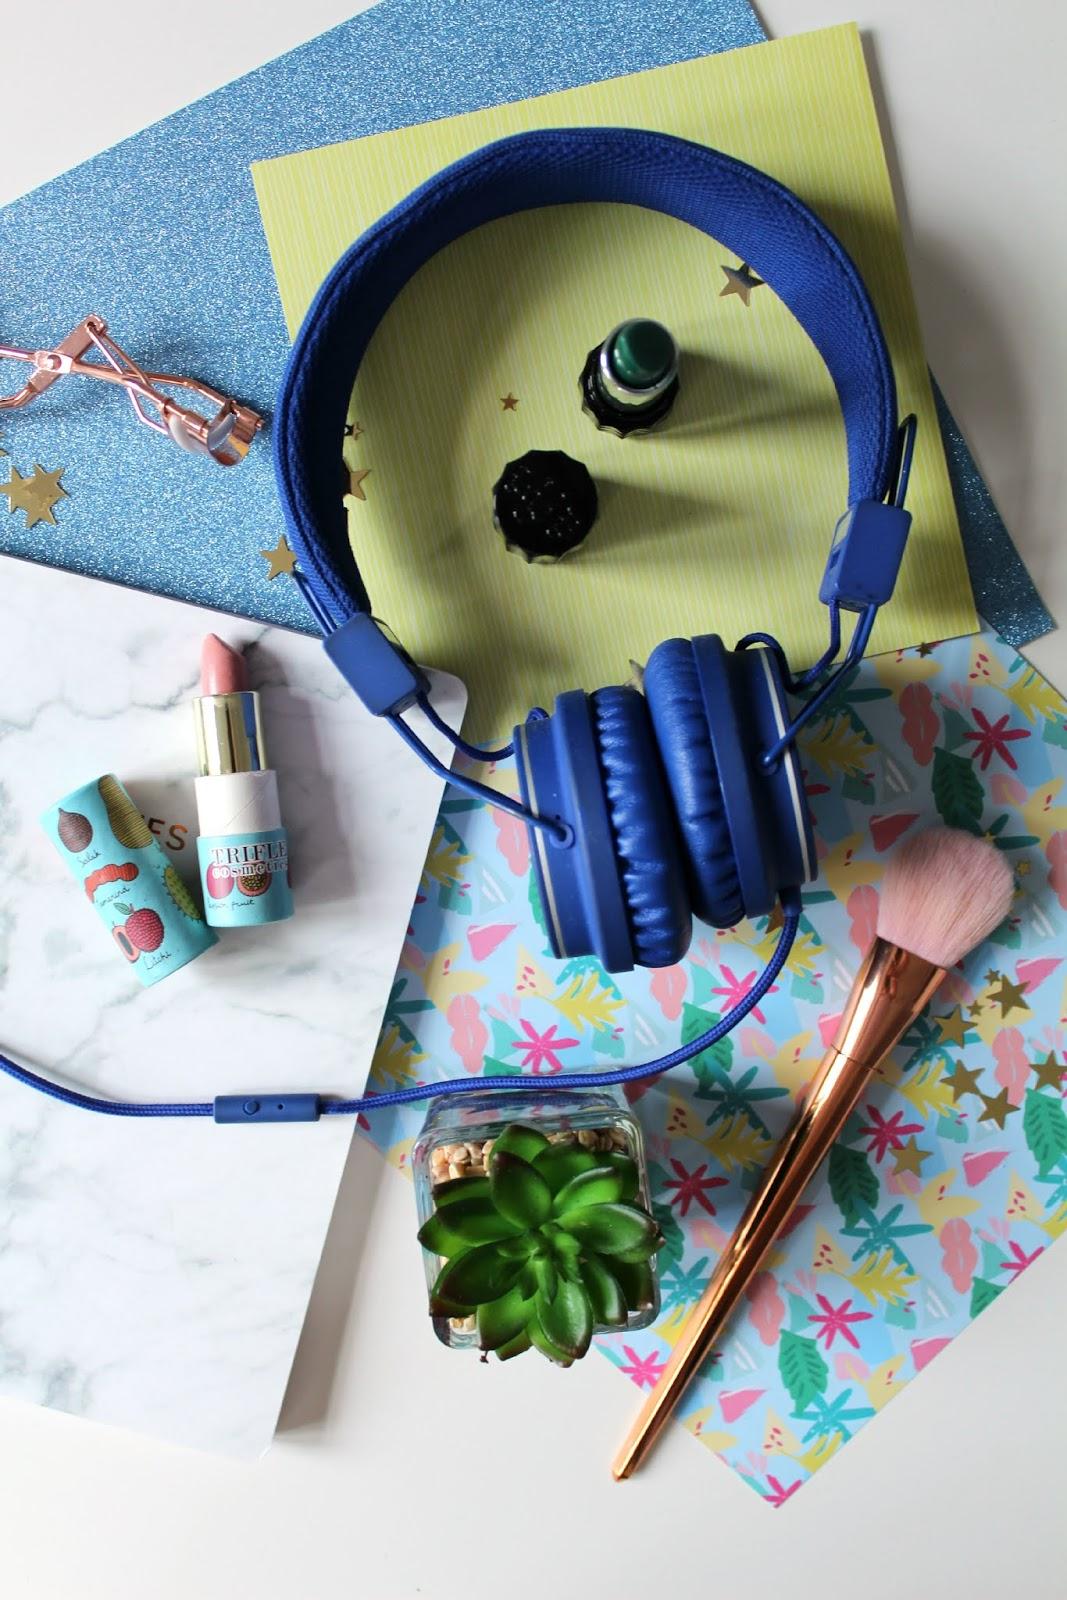 music wishlist, pop music, music blogger, lifestyle blogger